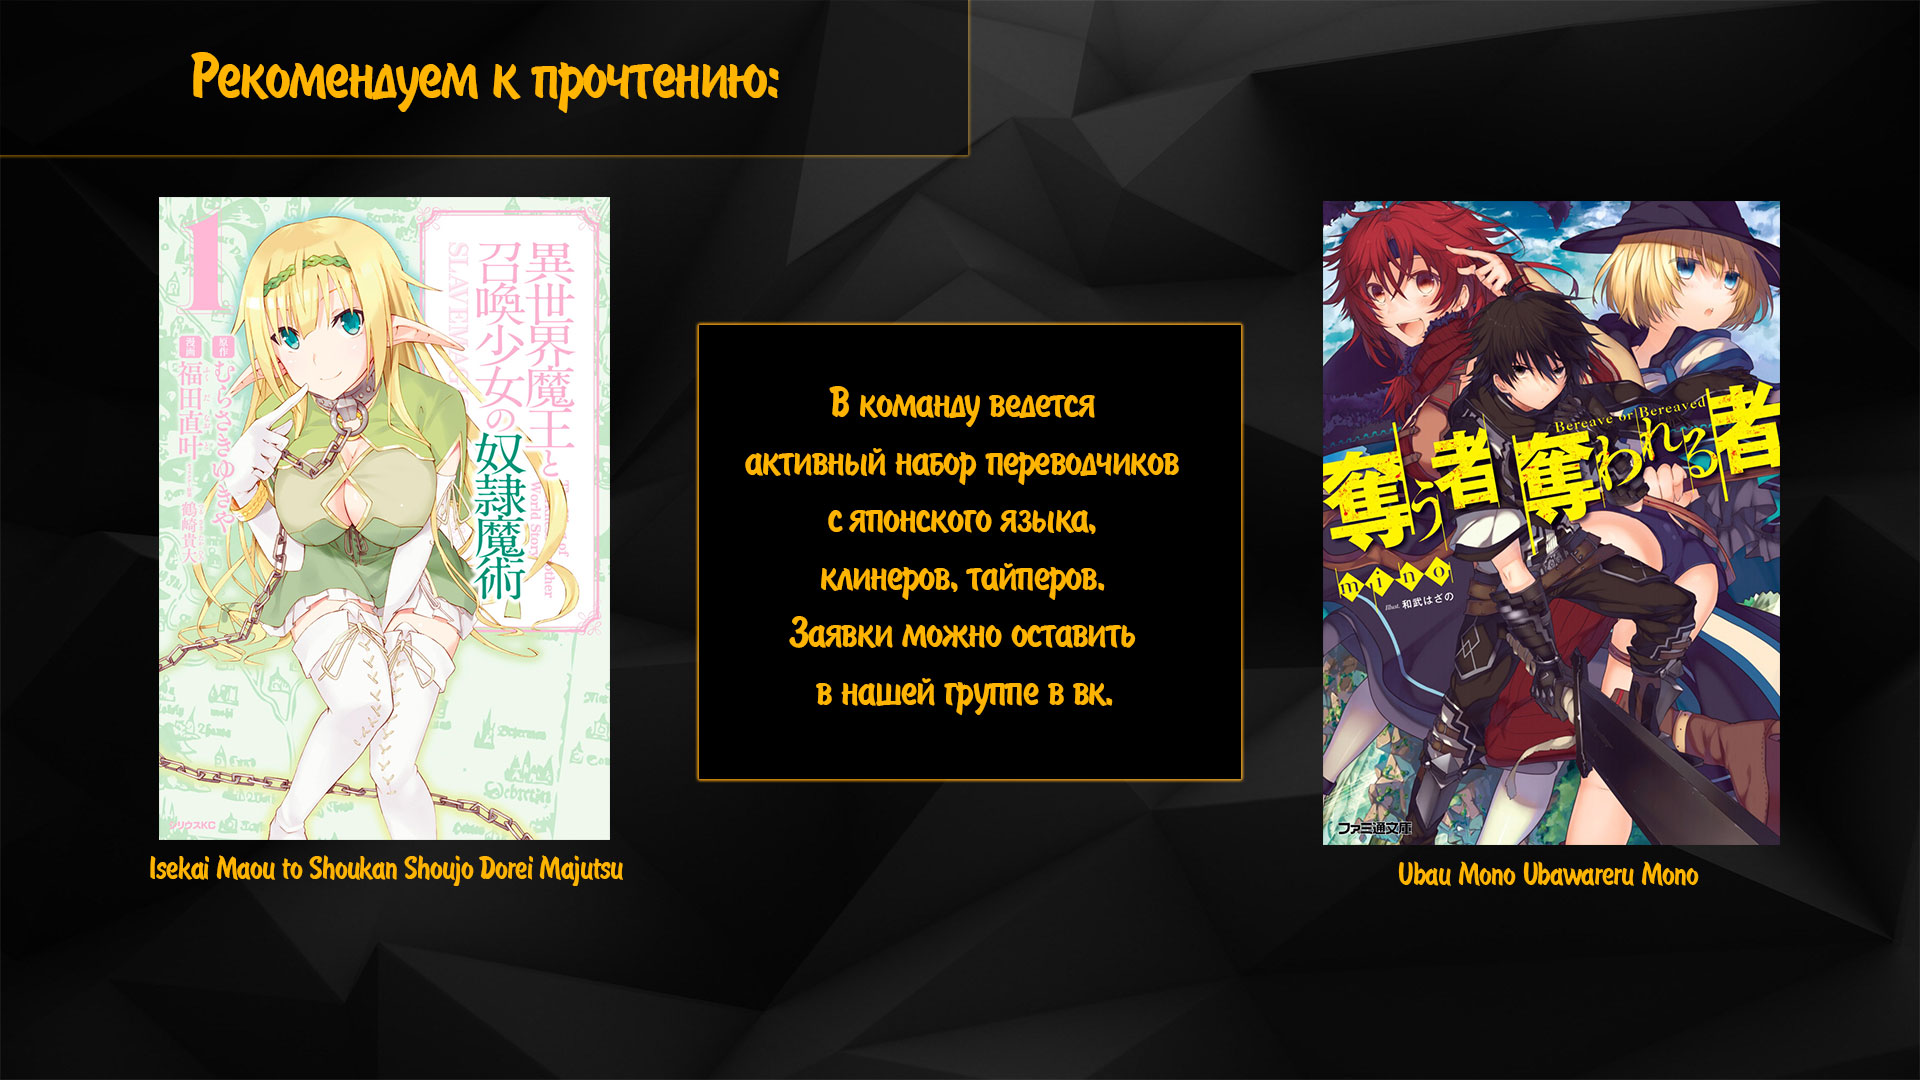 https://r1.ninemanga.com/comics/pic2/13/33357/416783/1533543024451.jpg Page 39